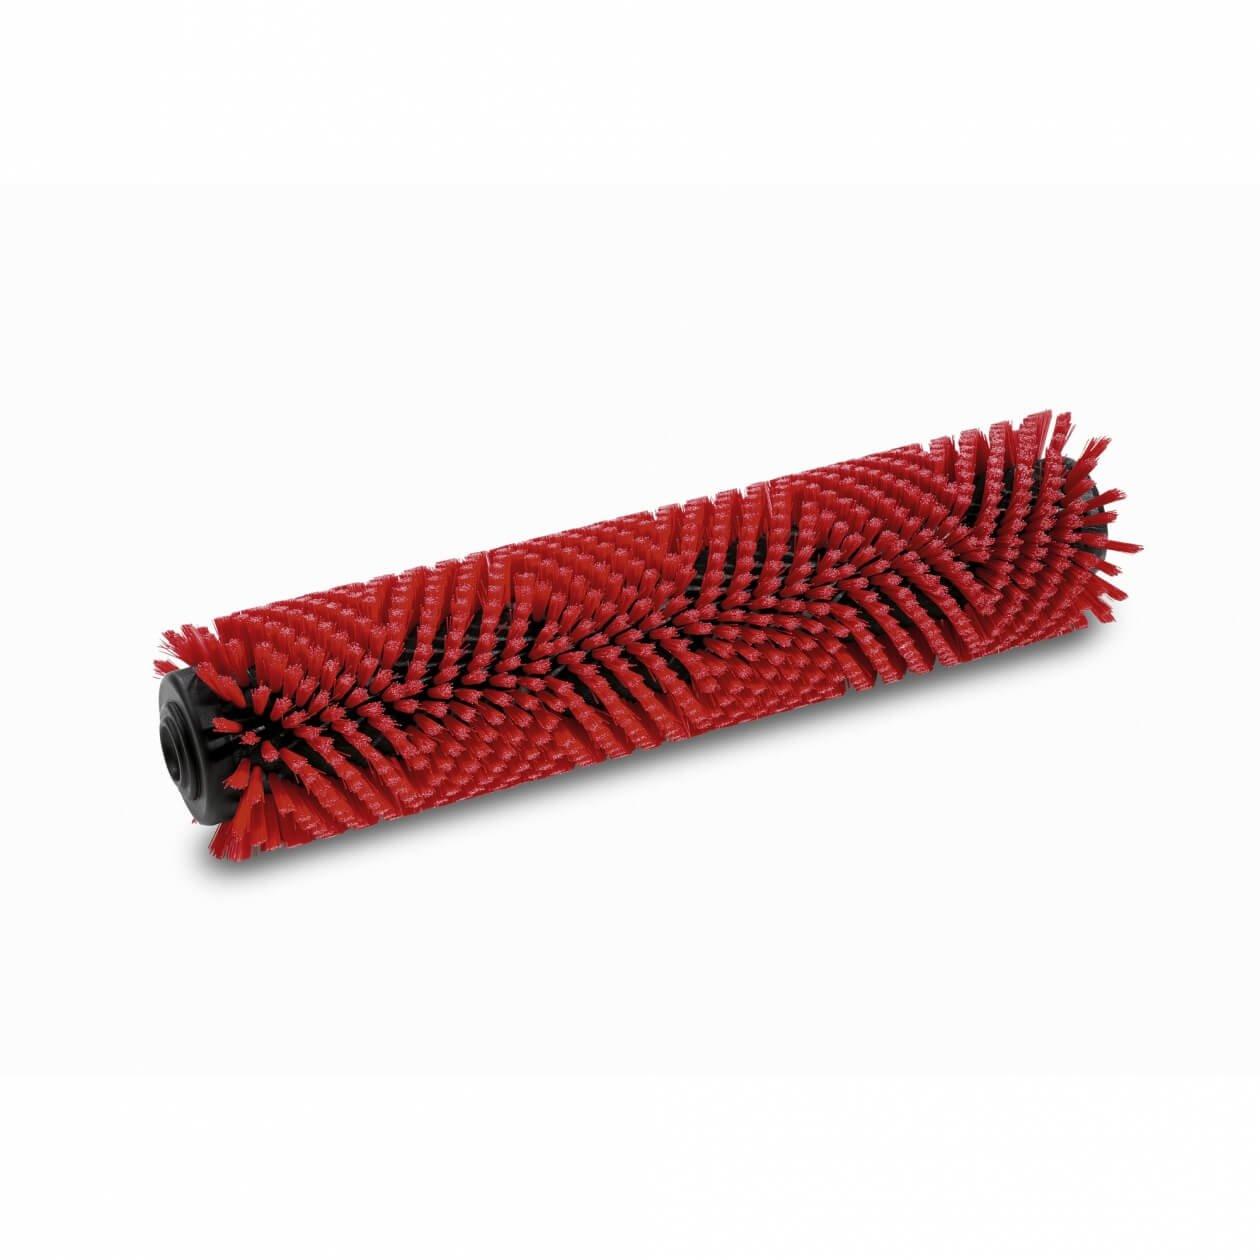 Image of   Kärcher, børstevalse 350 mm, rød, medium - 40370310